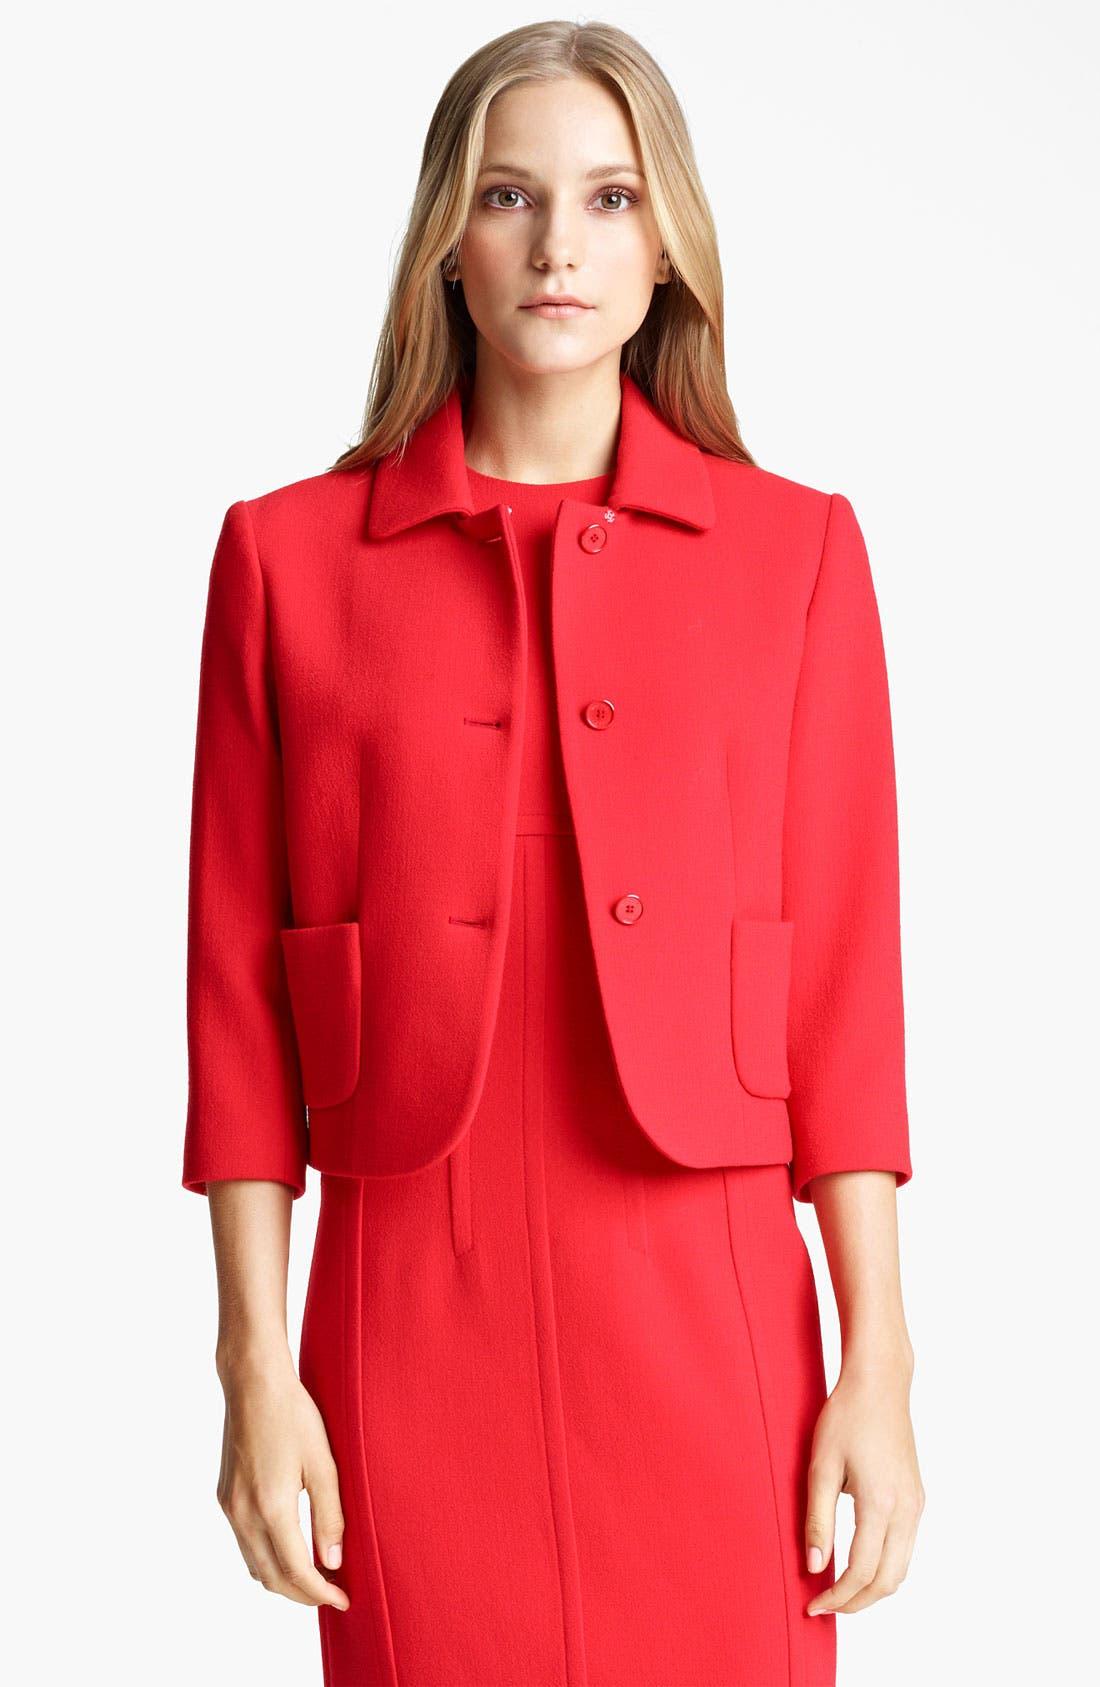 Alternate Image 1 Selected - Michael Kors Bouclé Jacket